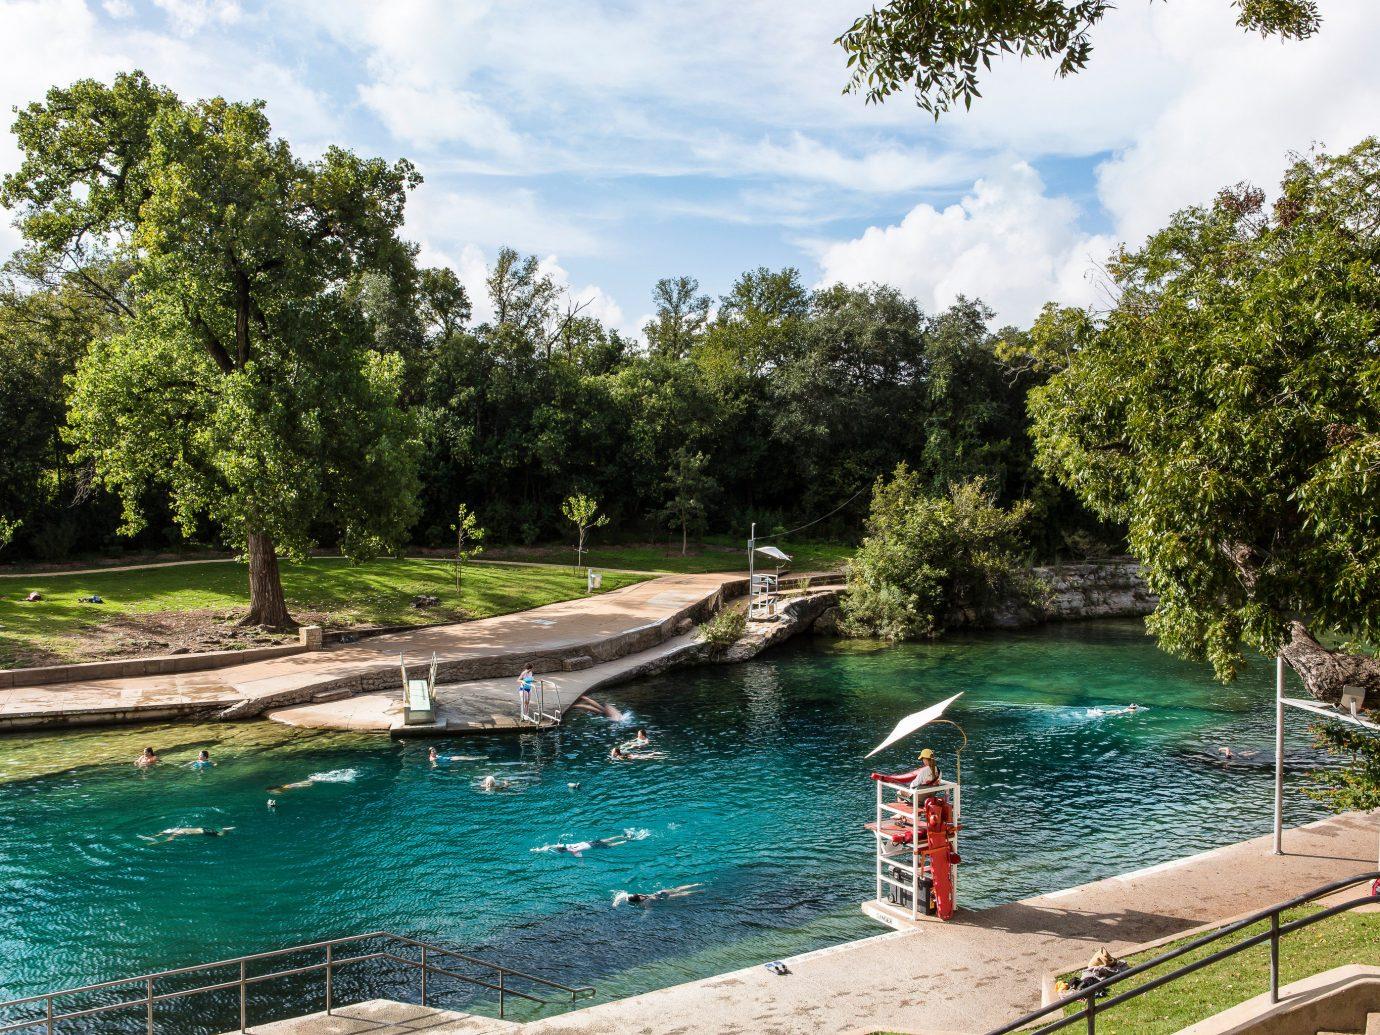 Arts + Culture Austin Nashville Trip Ideas Weekend Getaways tree outdoor water Boat swimming pool estate River Pool waterway Lake pond docked backyard shore swimming surrounded day